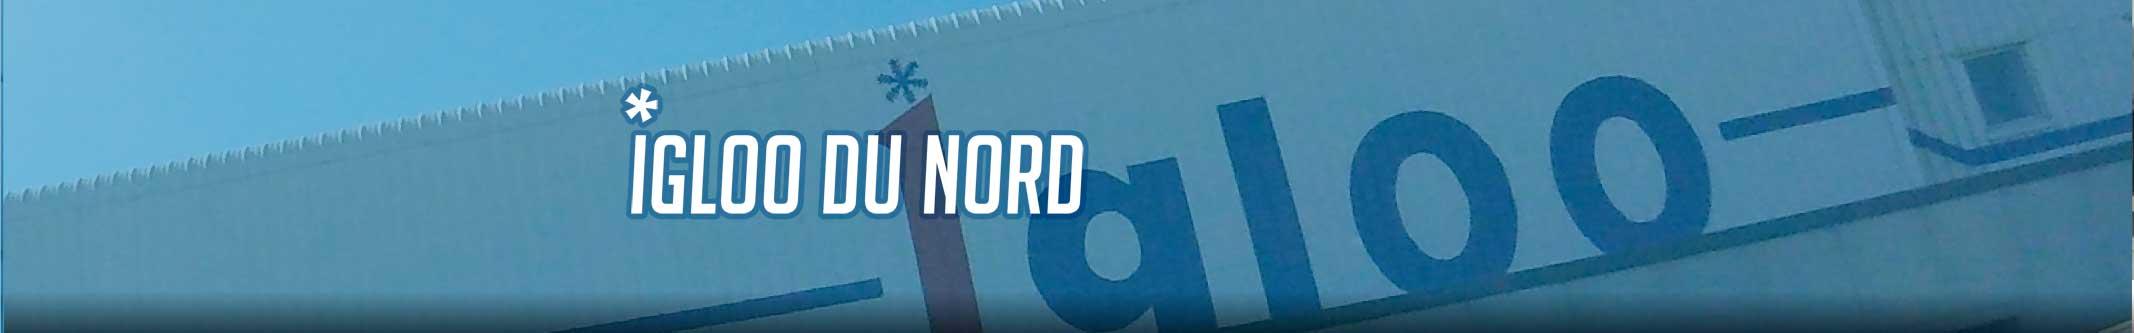 Igloo du Nord Entrepose en froid négatif des produits de la mer